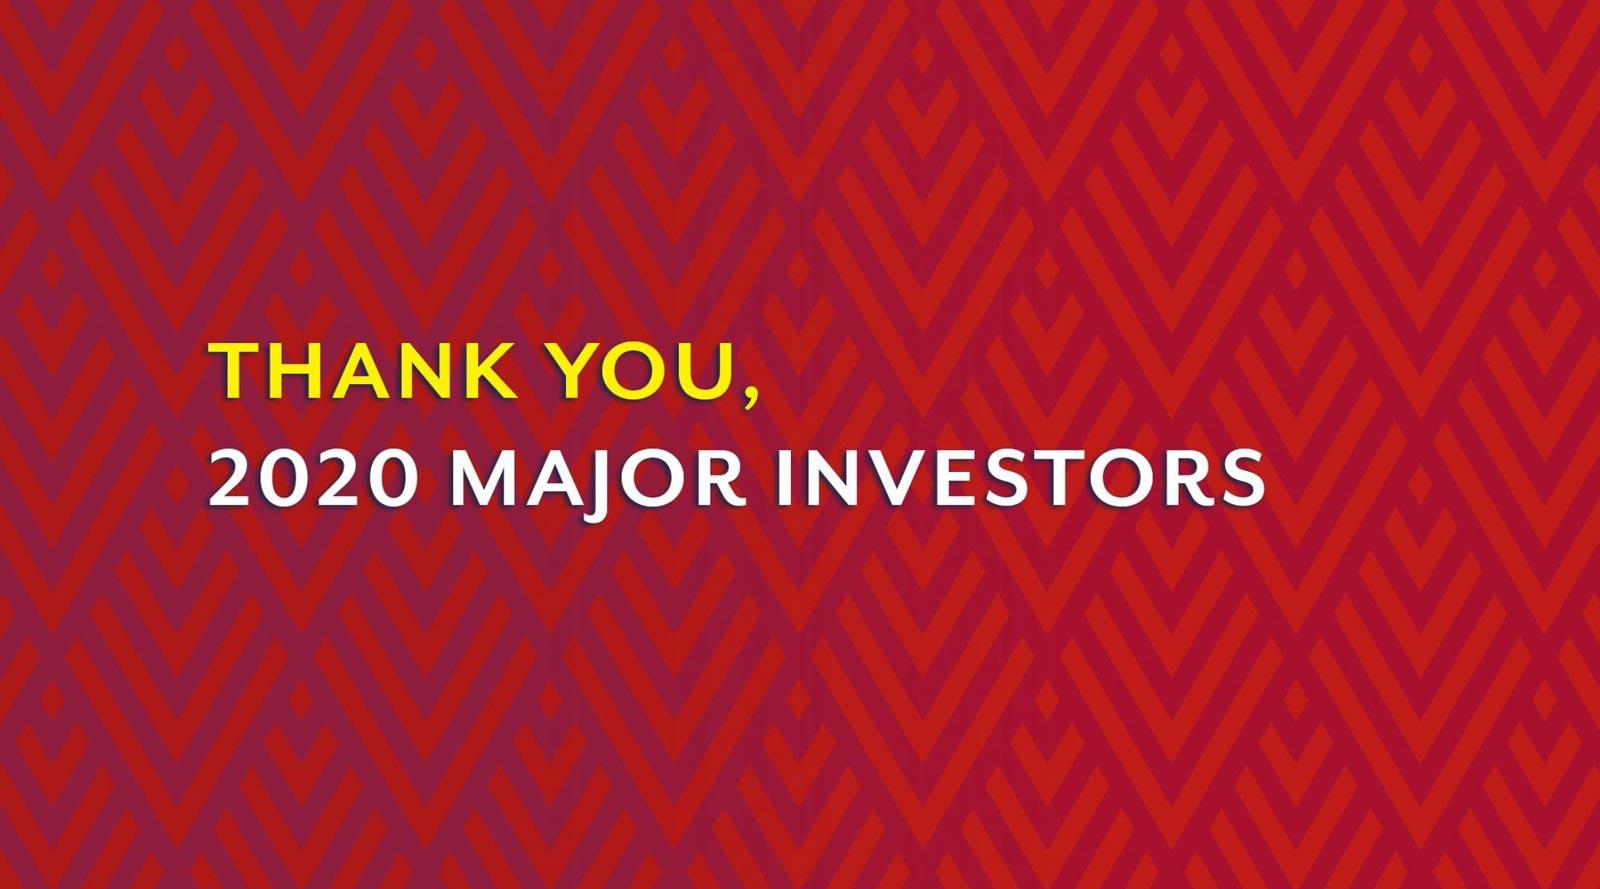 2020 Major Investors